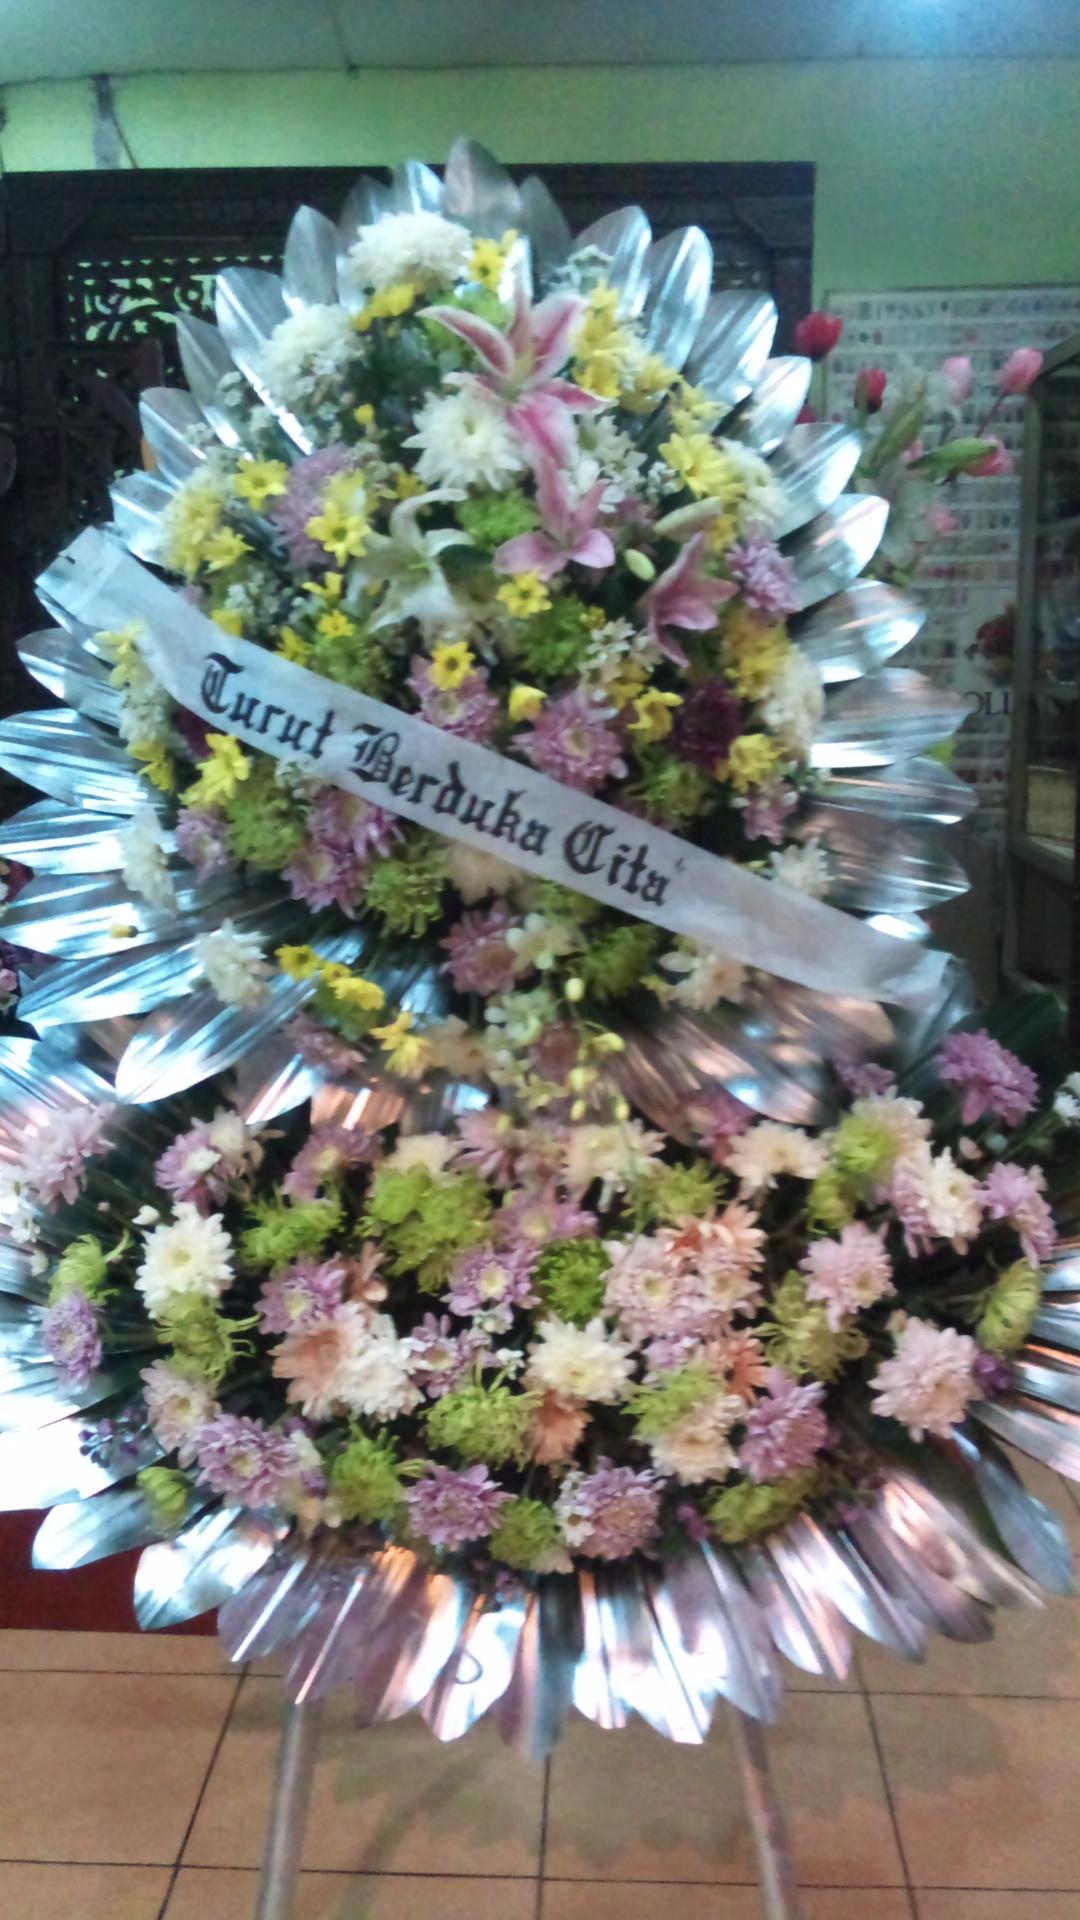 Image result for standing flower belasungkawa